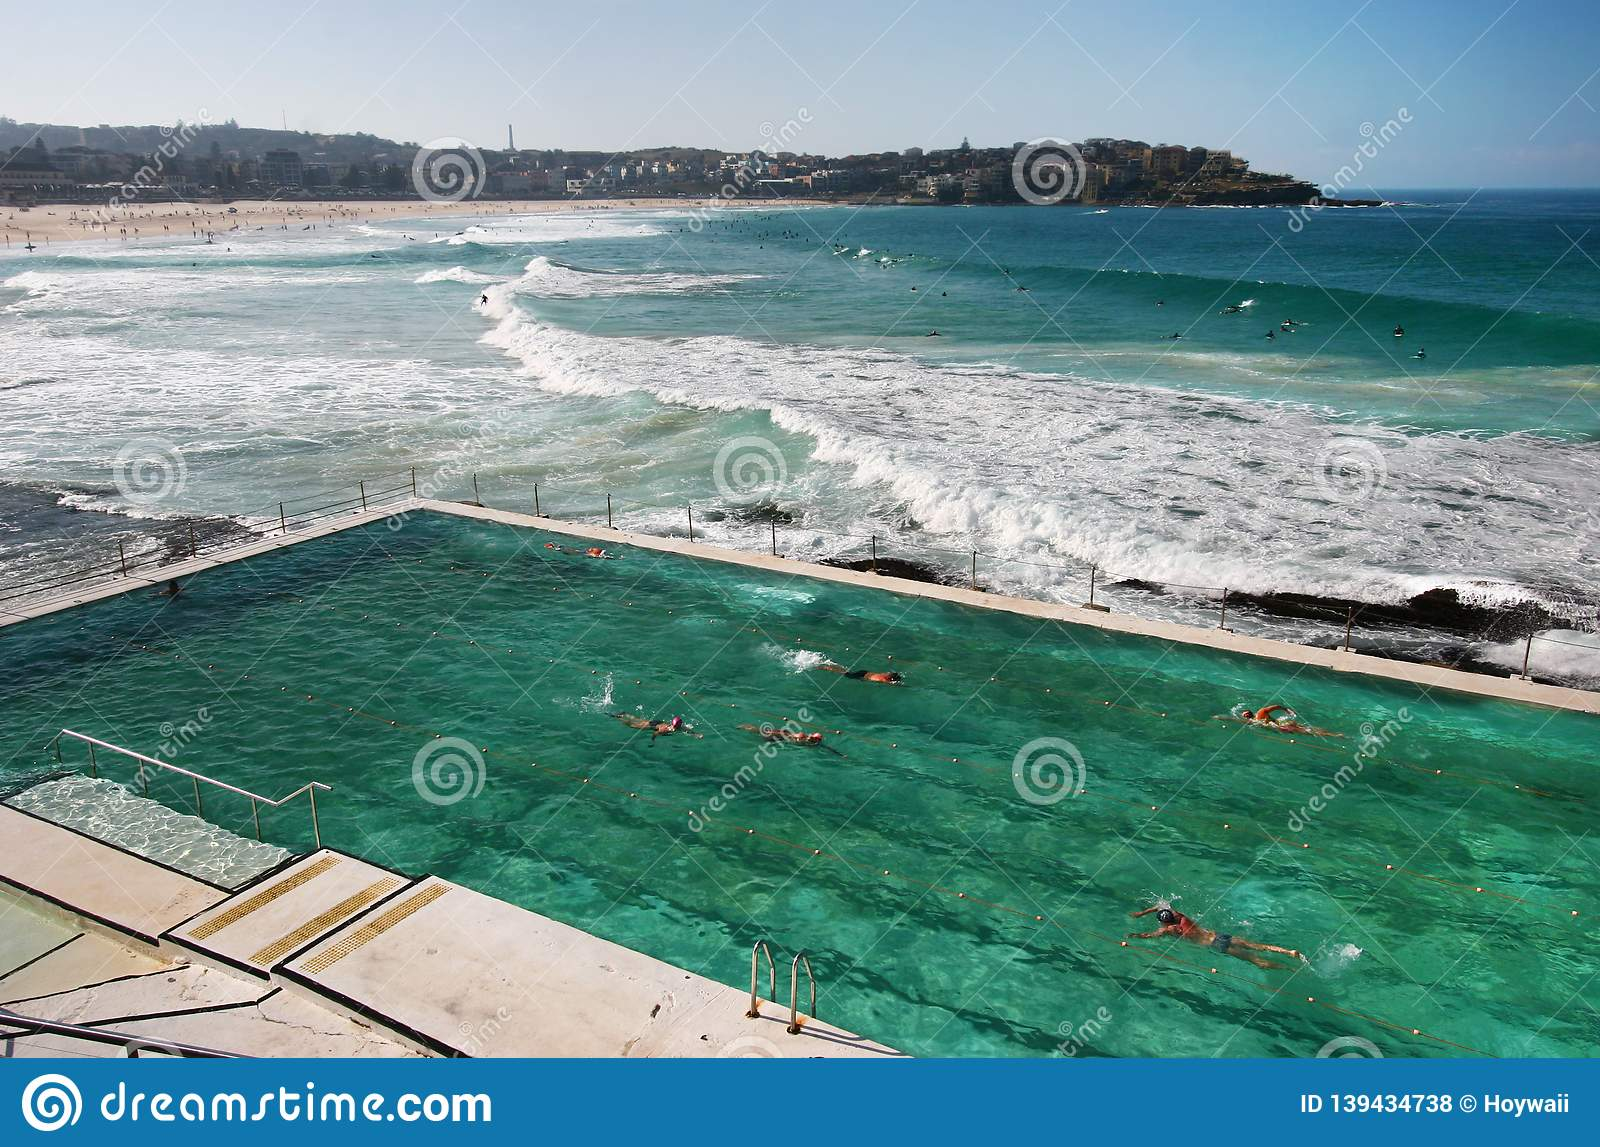 Seaside Public Iceberg Club Swimming Pool. Idyllic And ...